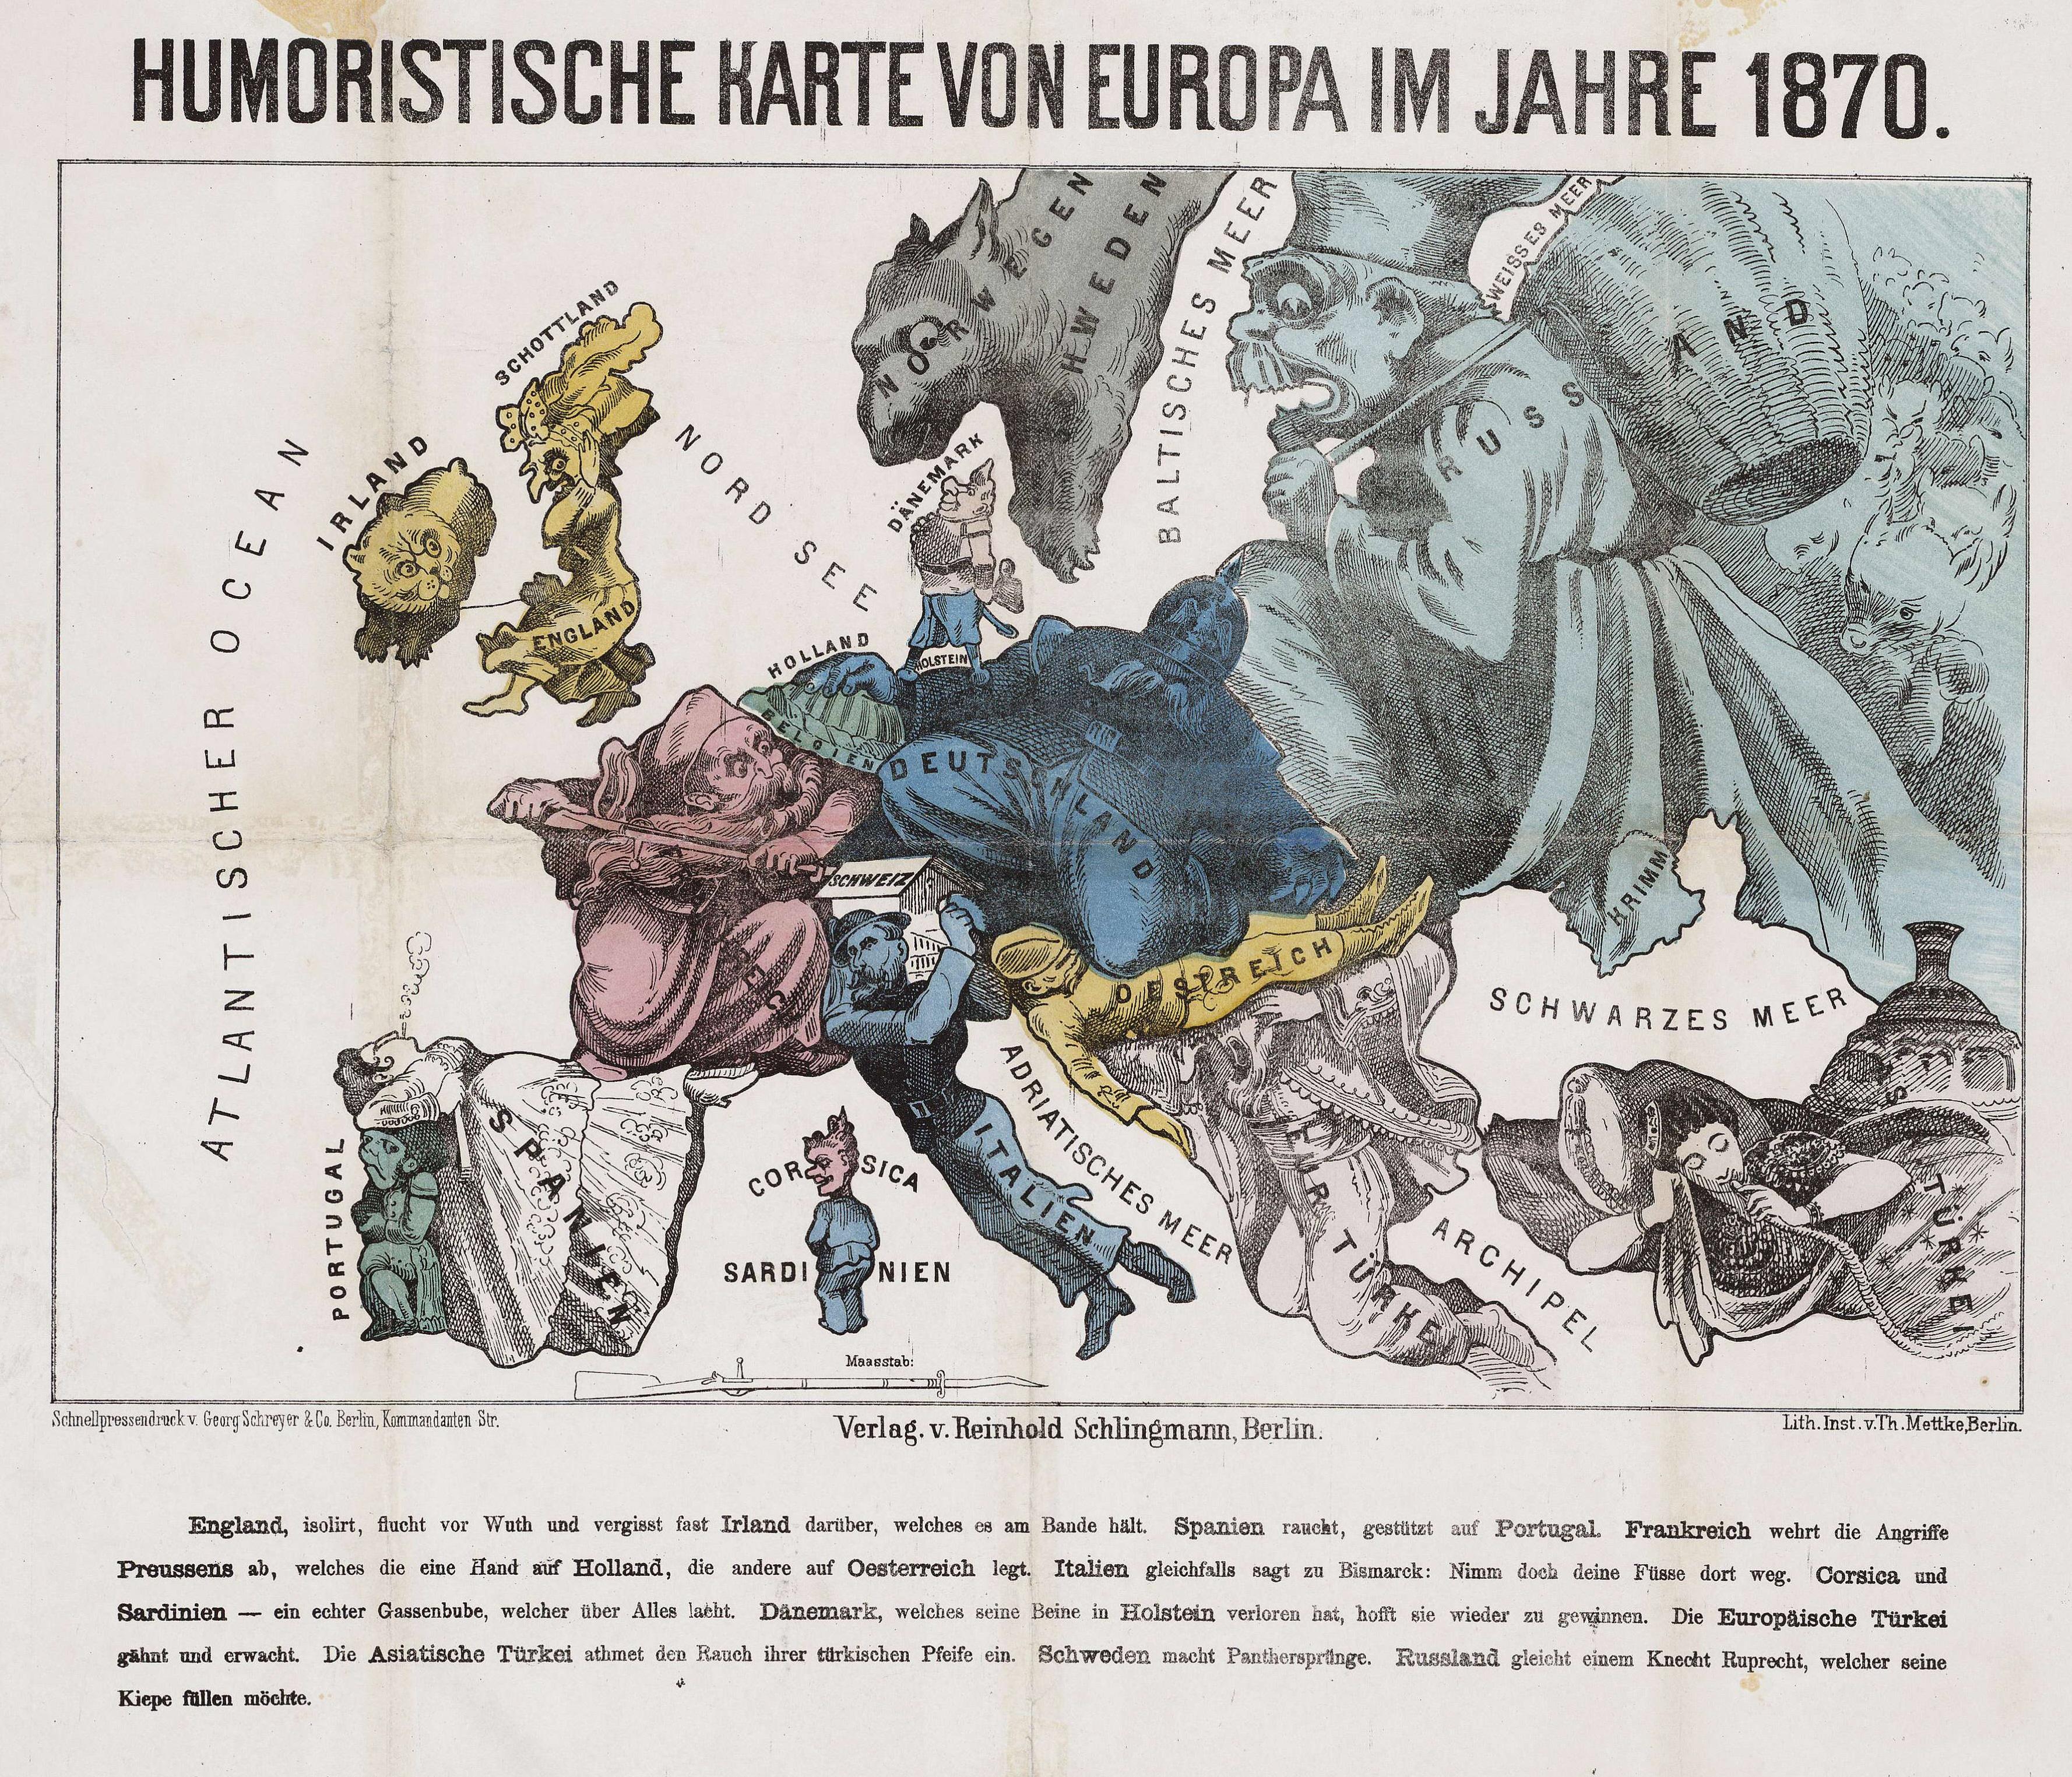 Humoristische Karte Von Europa 1914.Datei Humoristische Karte Europa 1870 Jpg Wikipedia